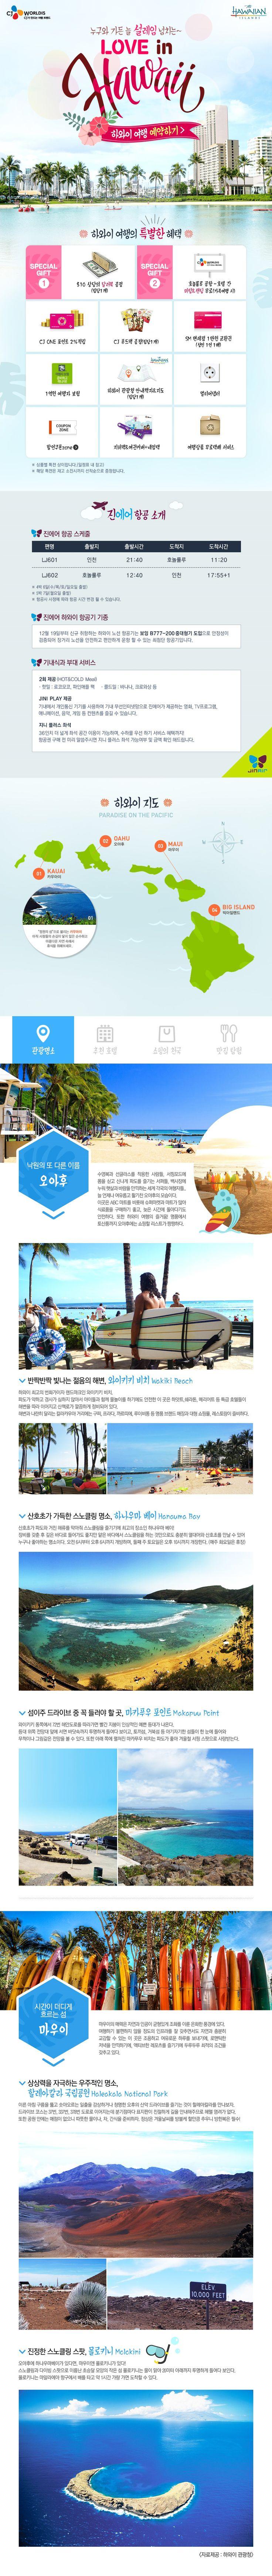 CJ월디스 - Love in Hawaii (웹 프로모션, 이벤트 디자인)